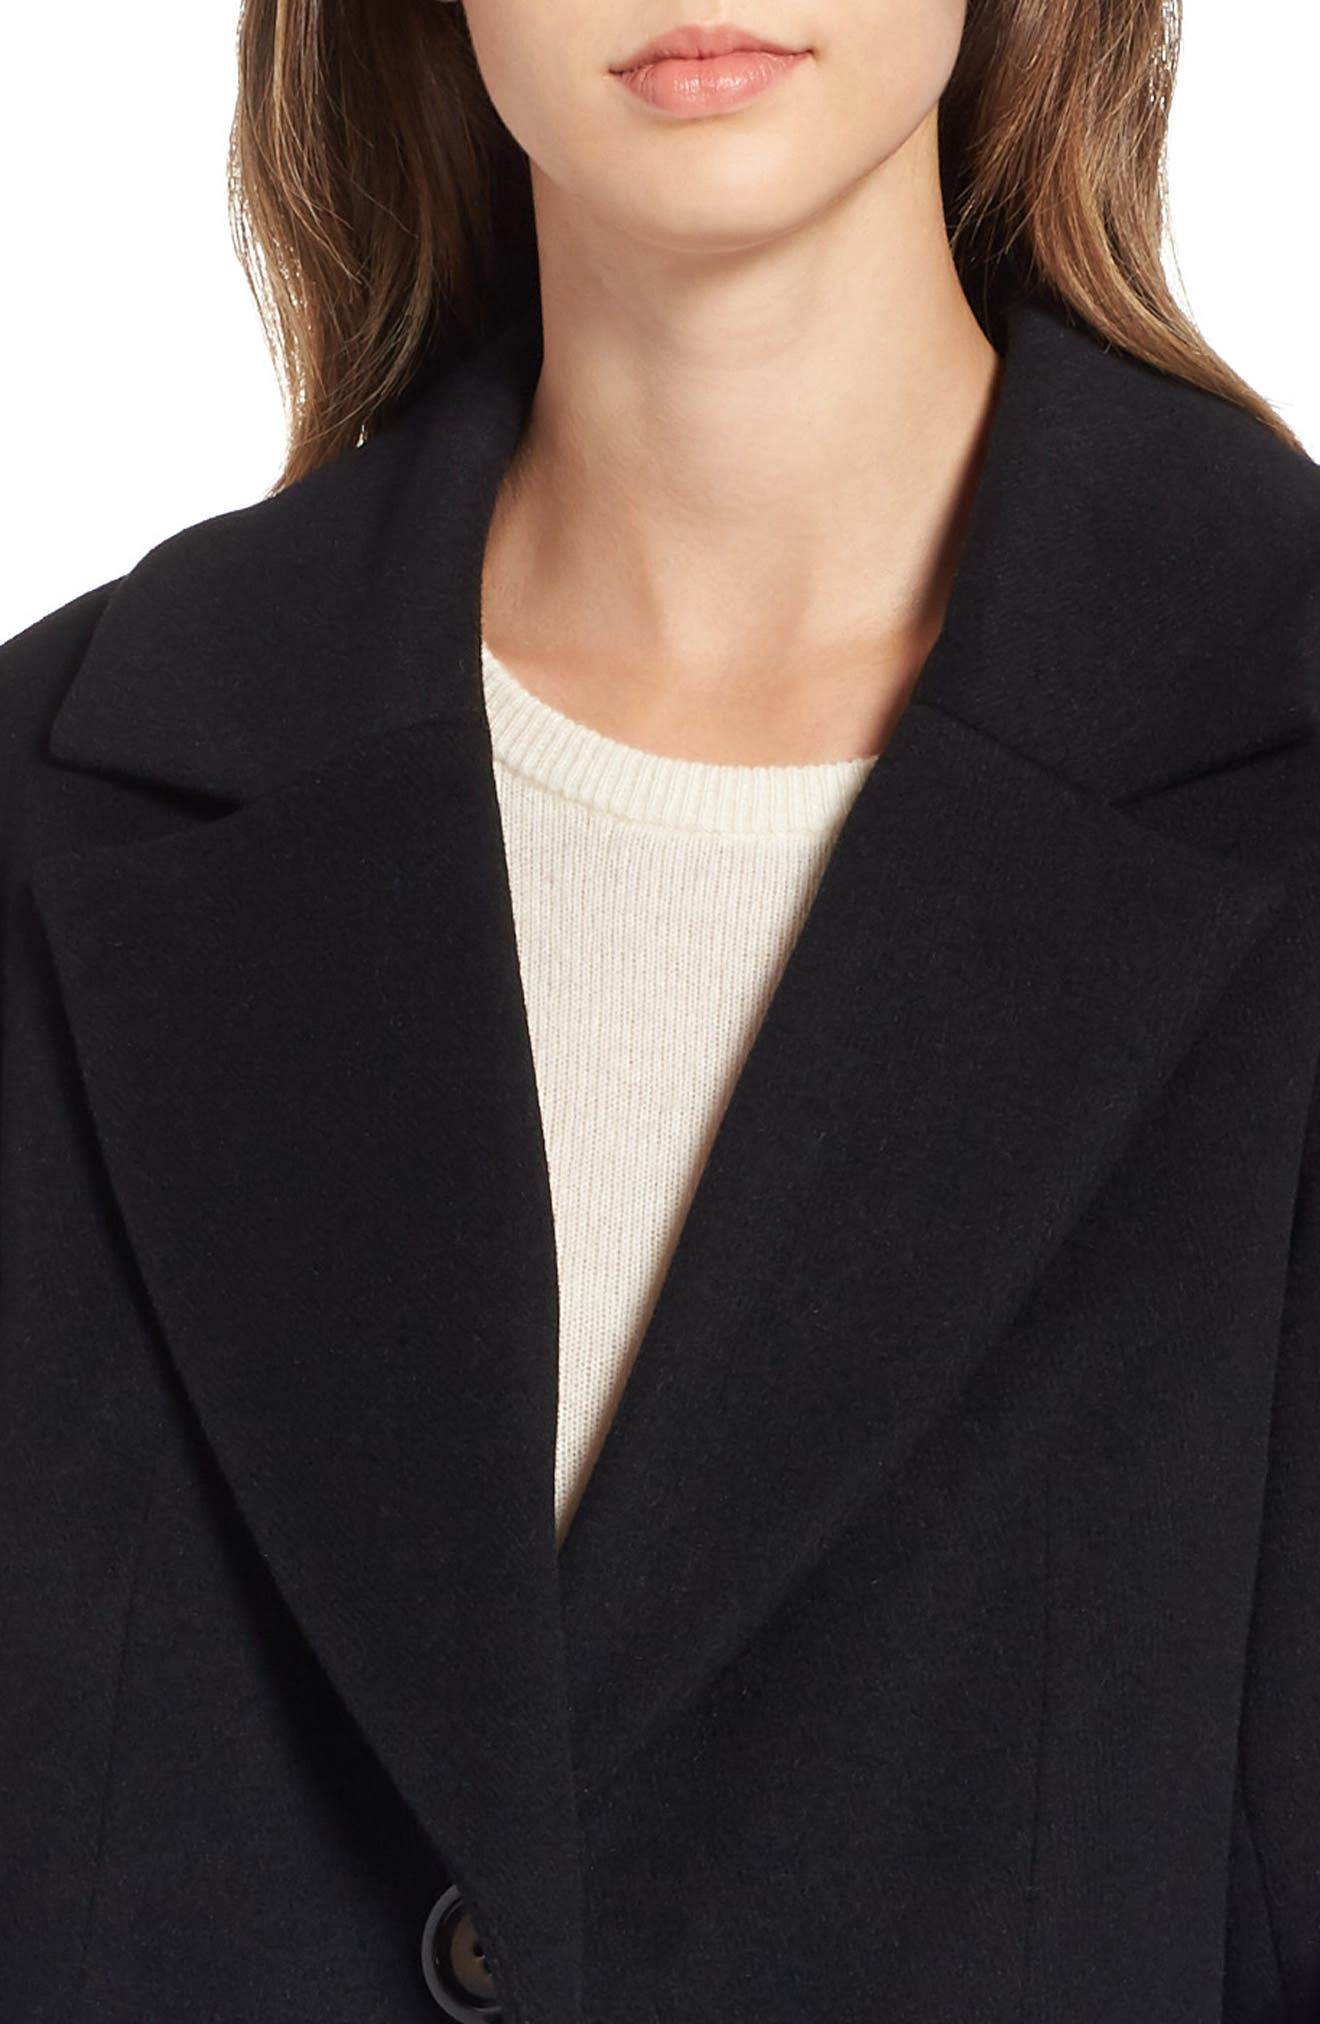 RACHEL RACHEL ROY, Wool Blend Coat, Alternate thumbnail 5, color, BLACK